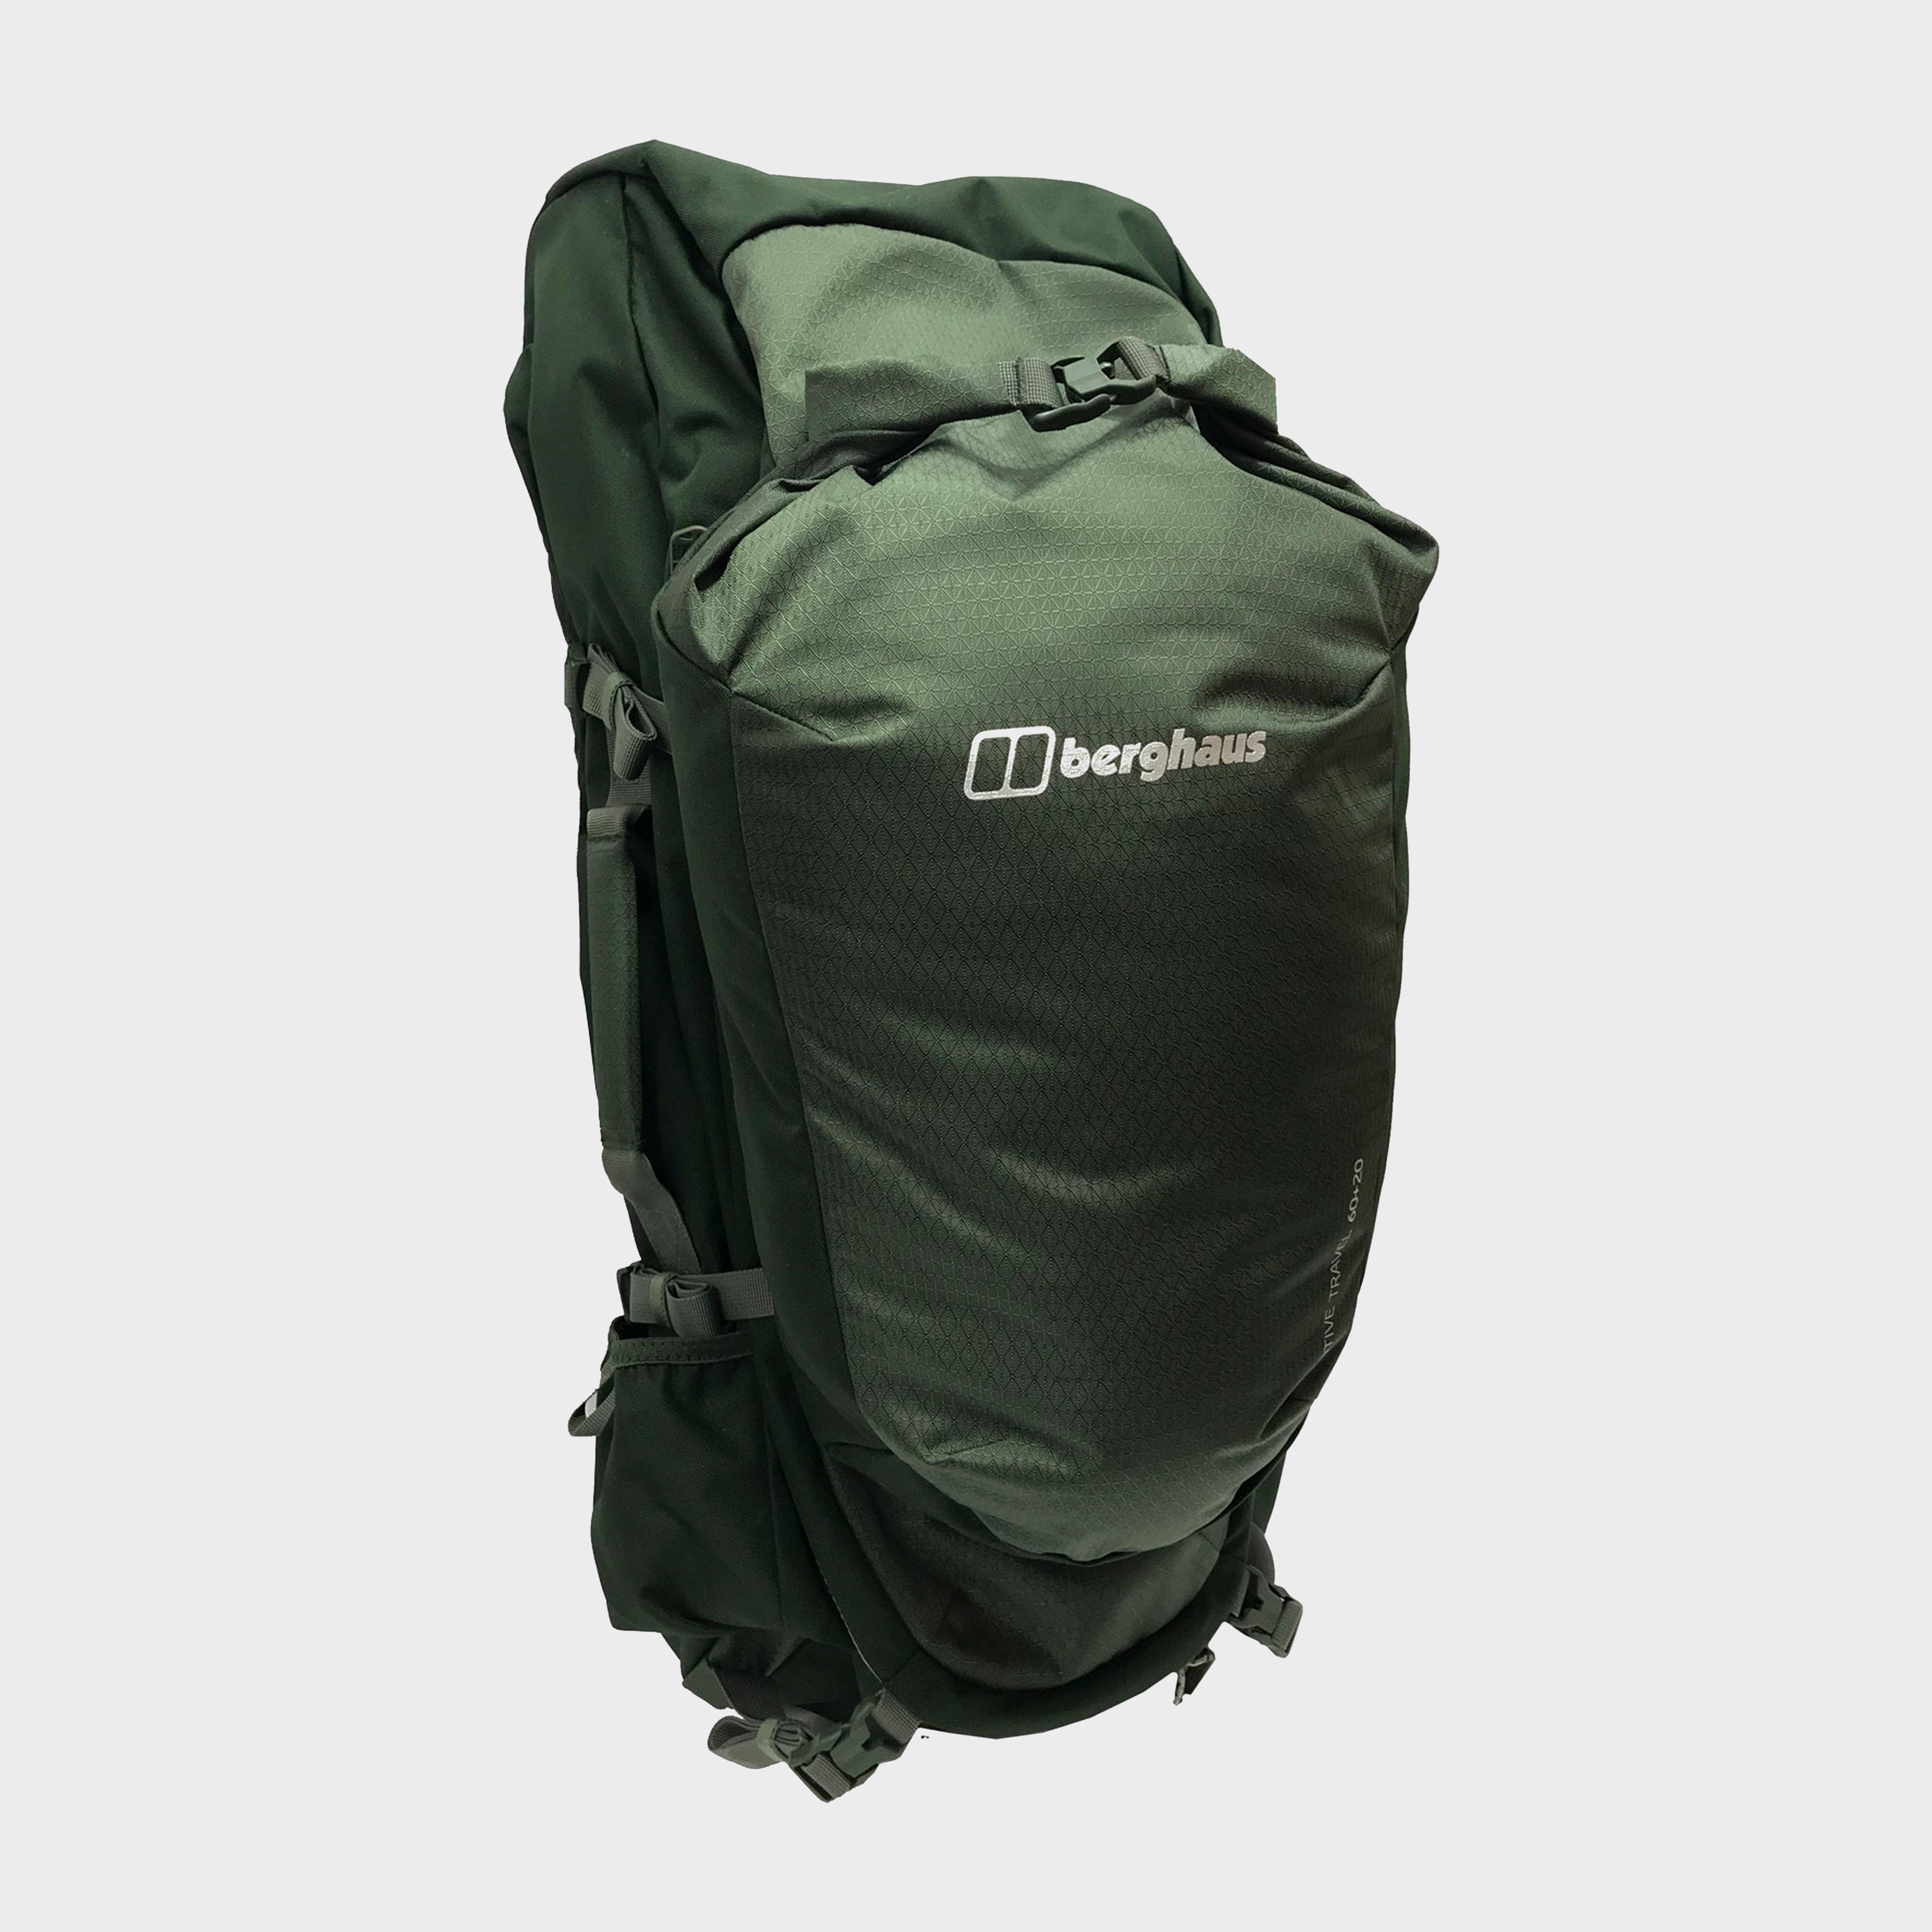 Berghaus Trailhead Travel 60 - Green/plus  Green/plus